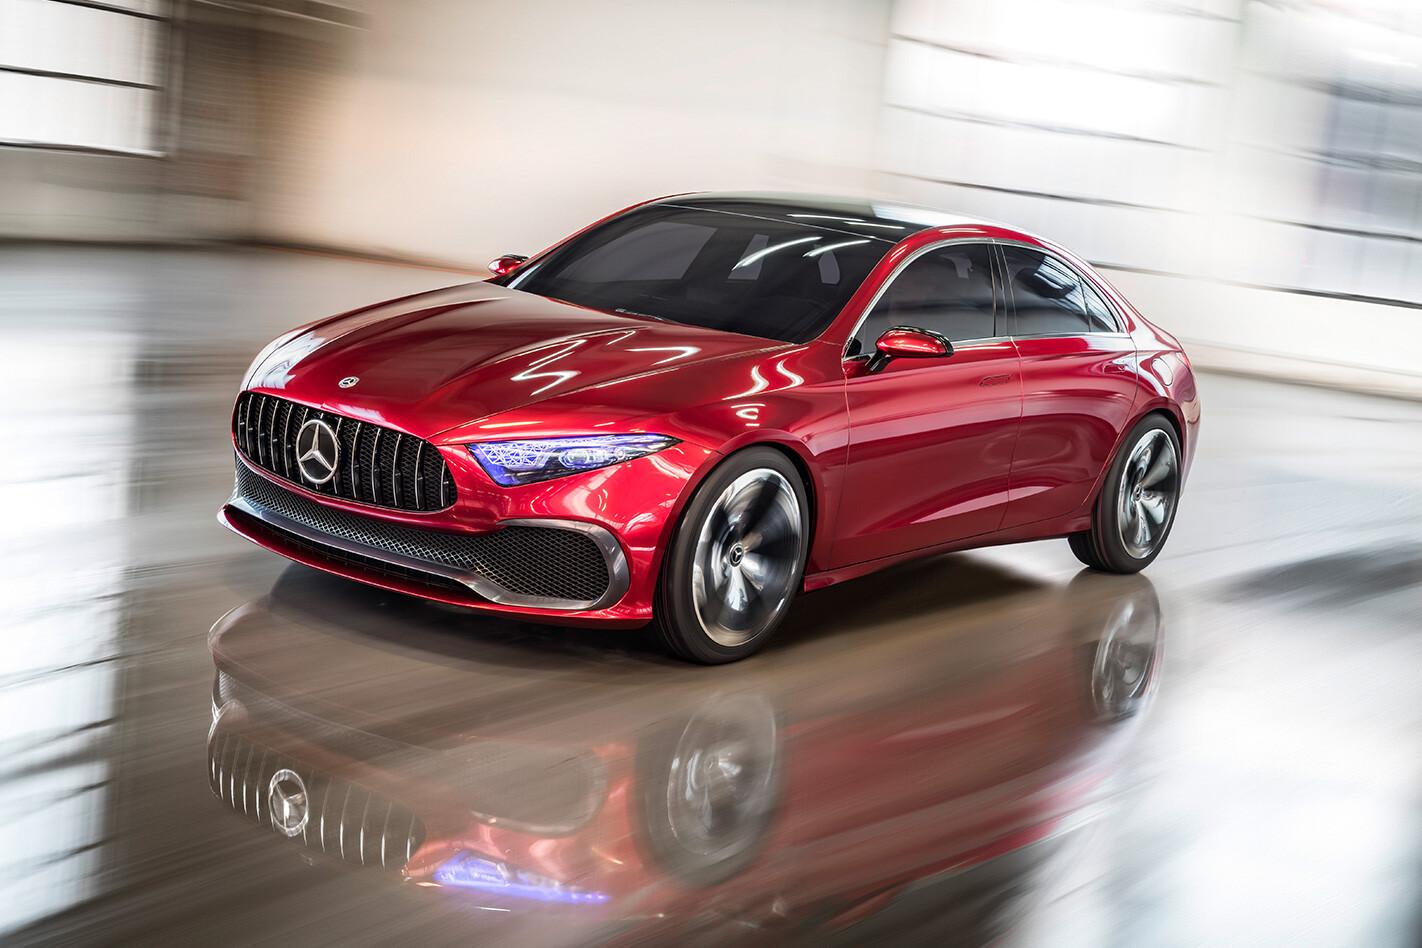 2018 Mercedes-Benz Concept A